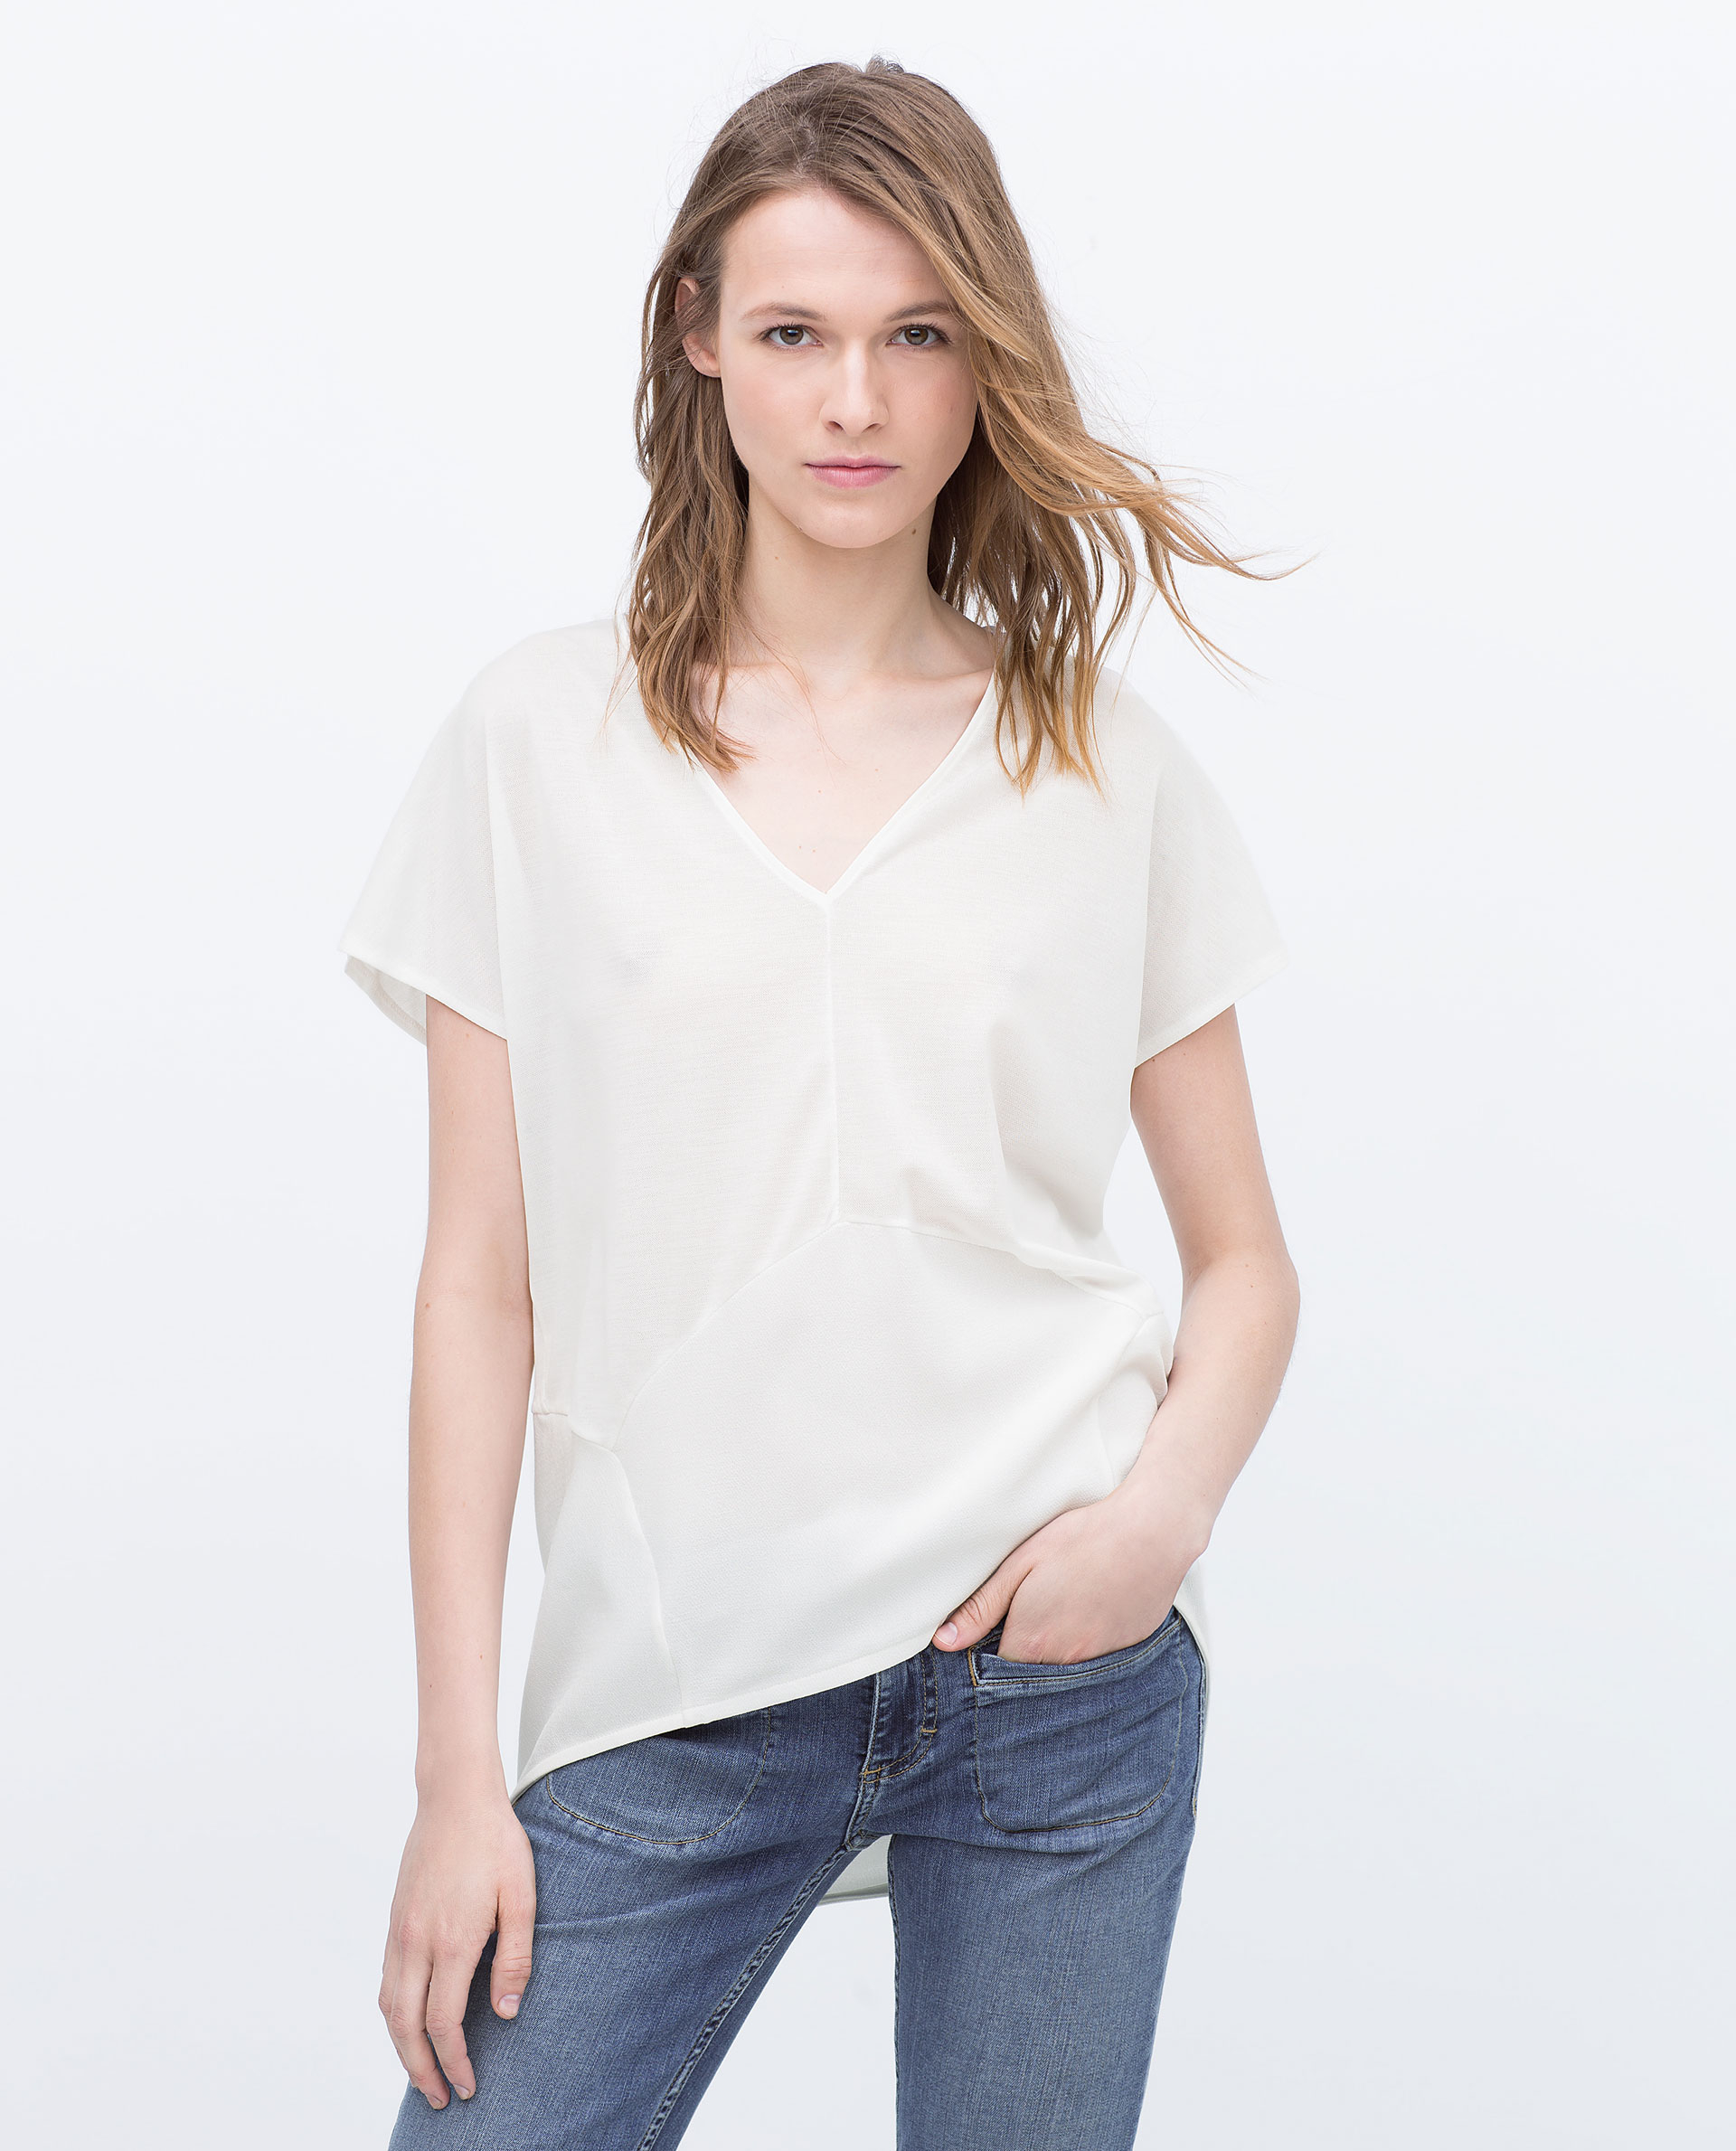 Zara Shirt Style Blouse 55